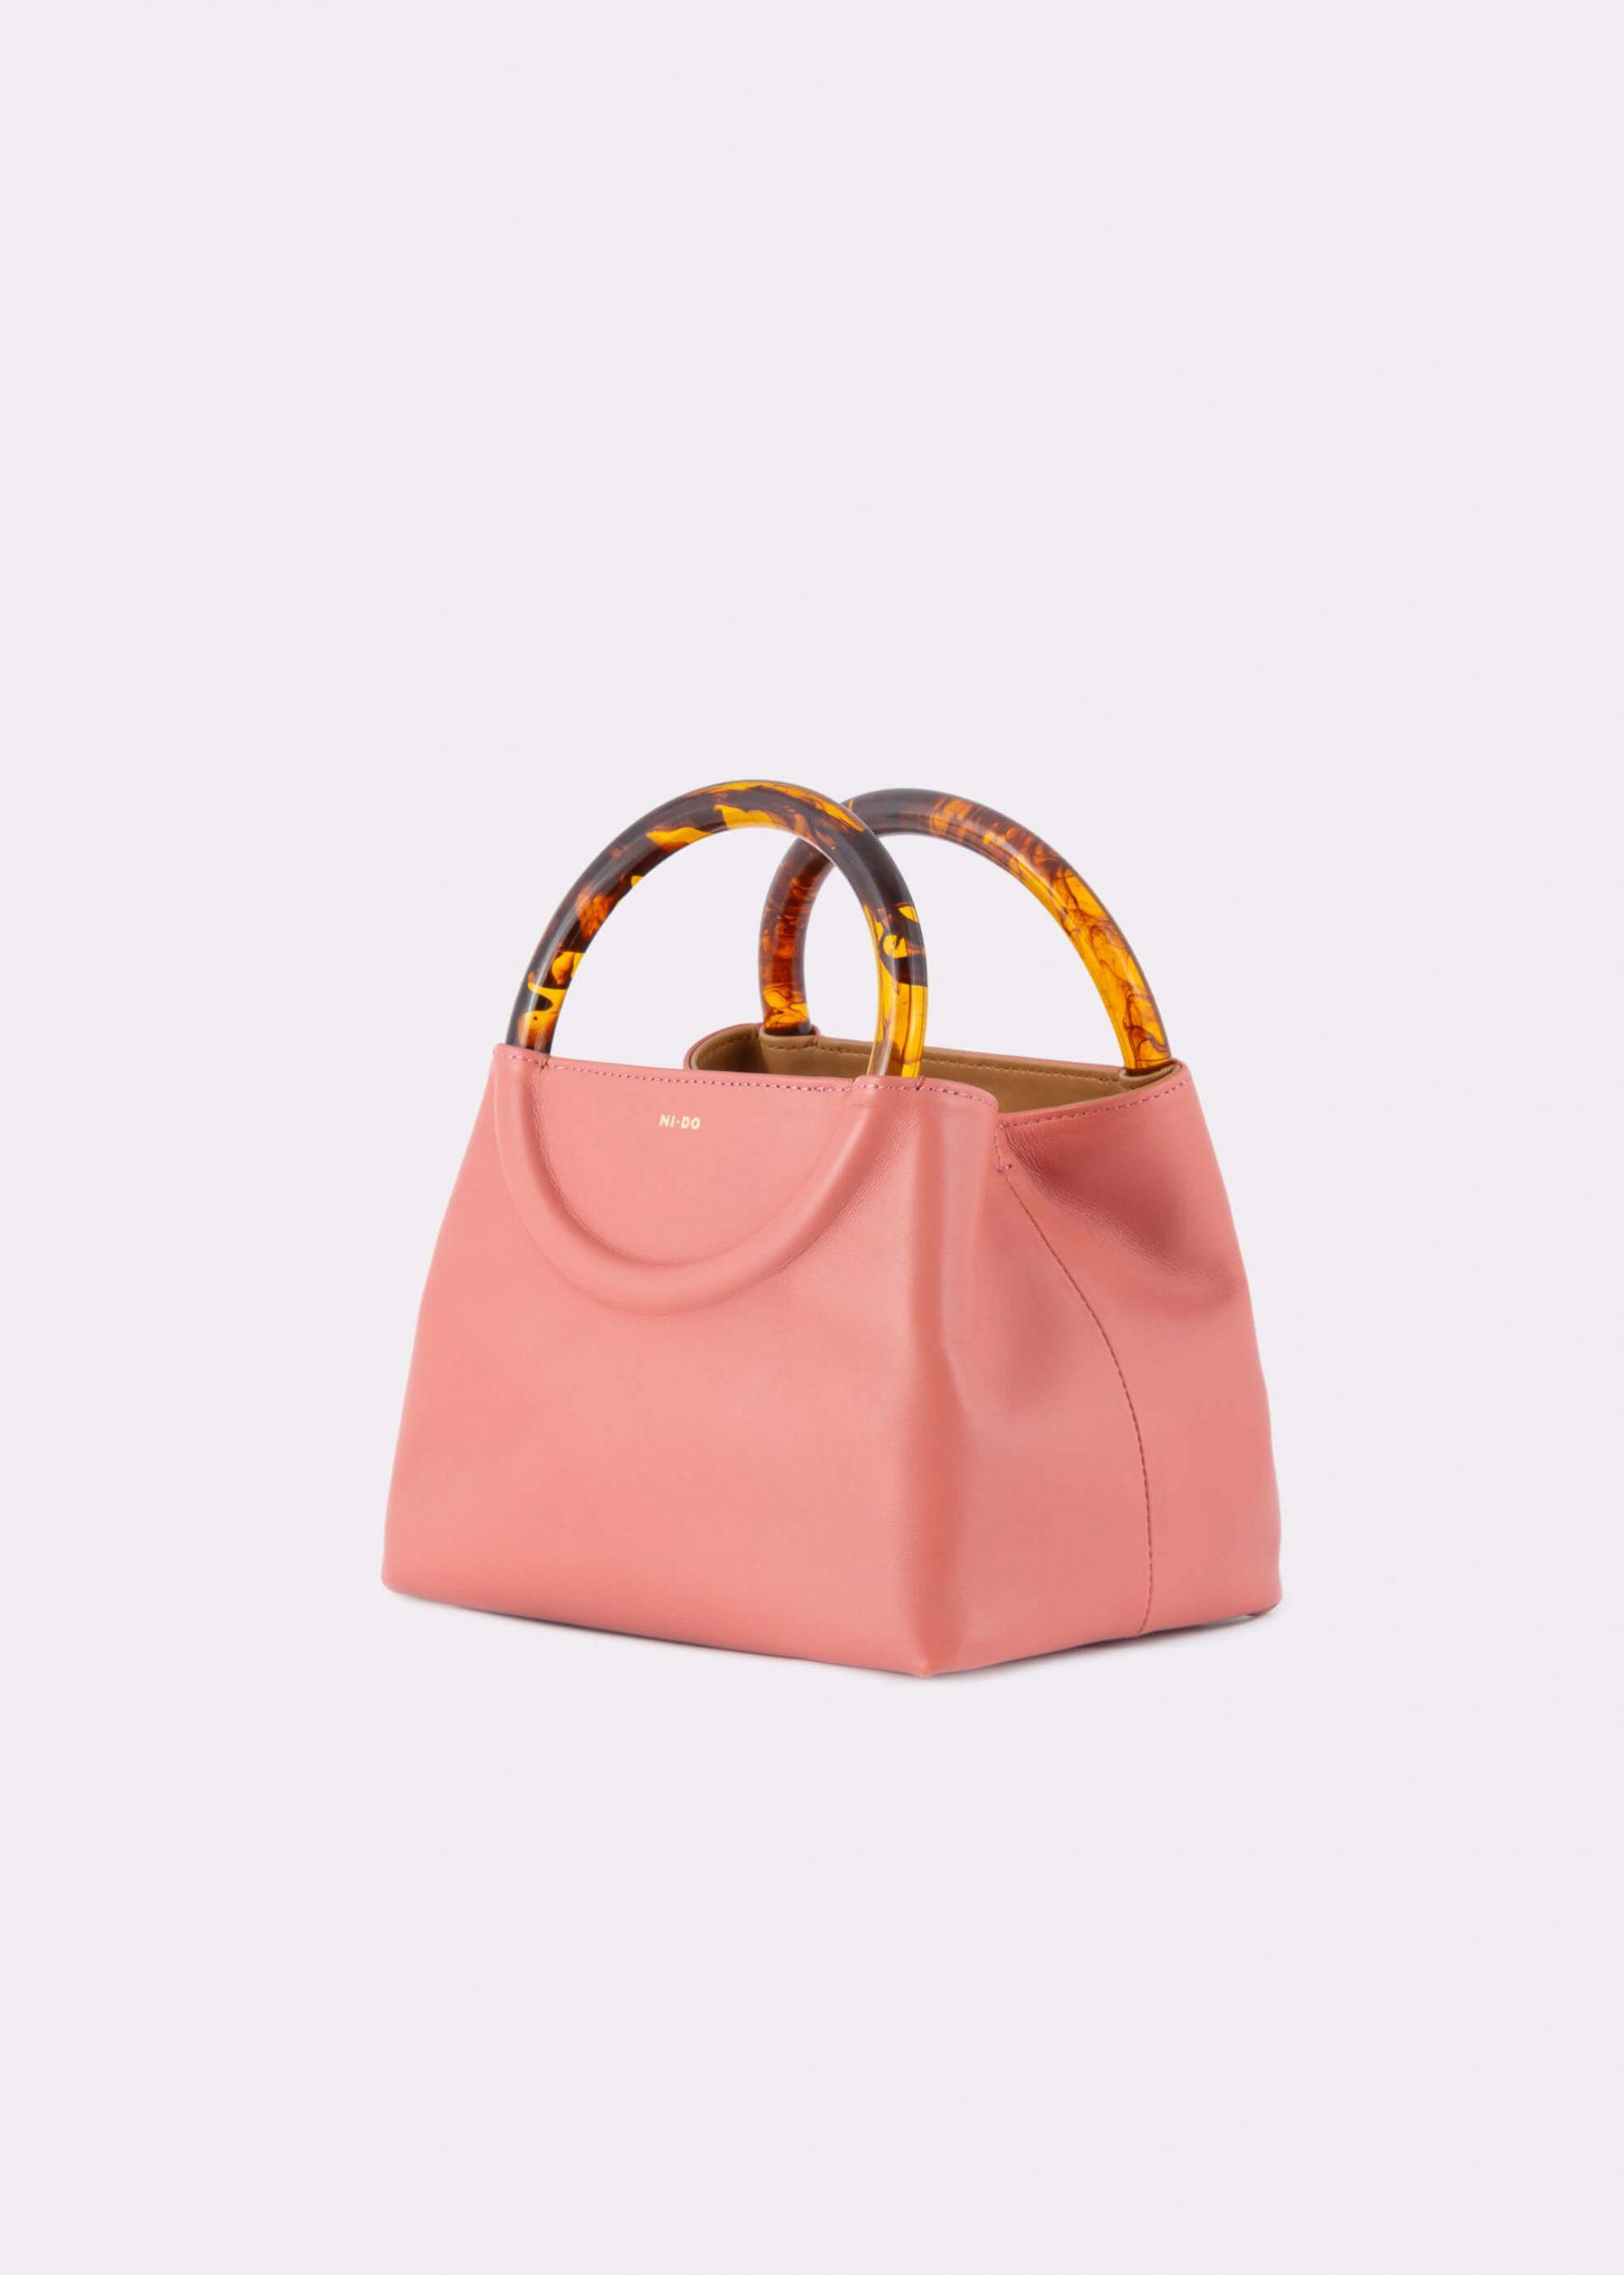 NIDO-Bolla_Mini-bag-blush_SIDE view